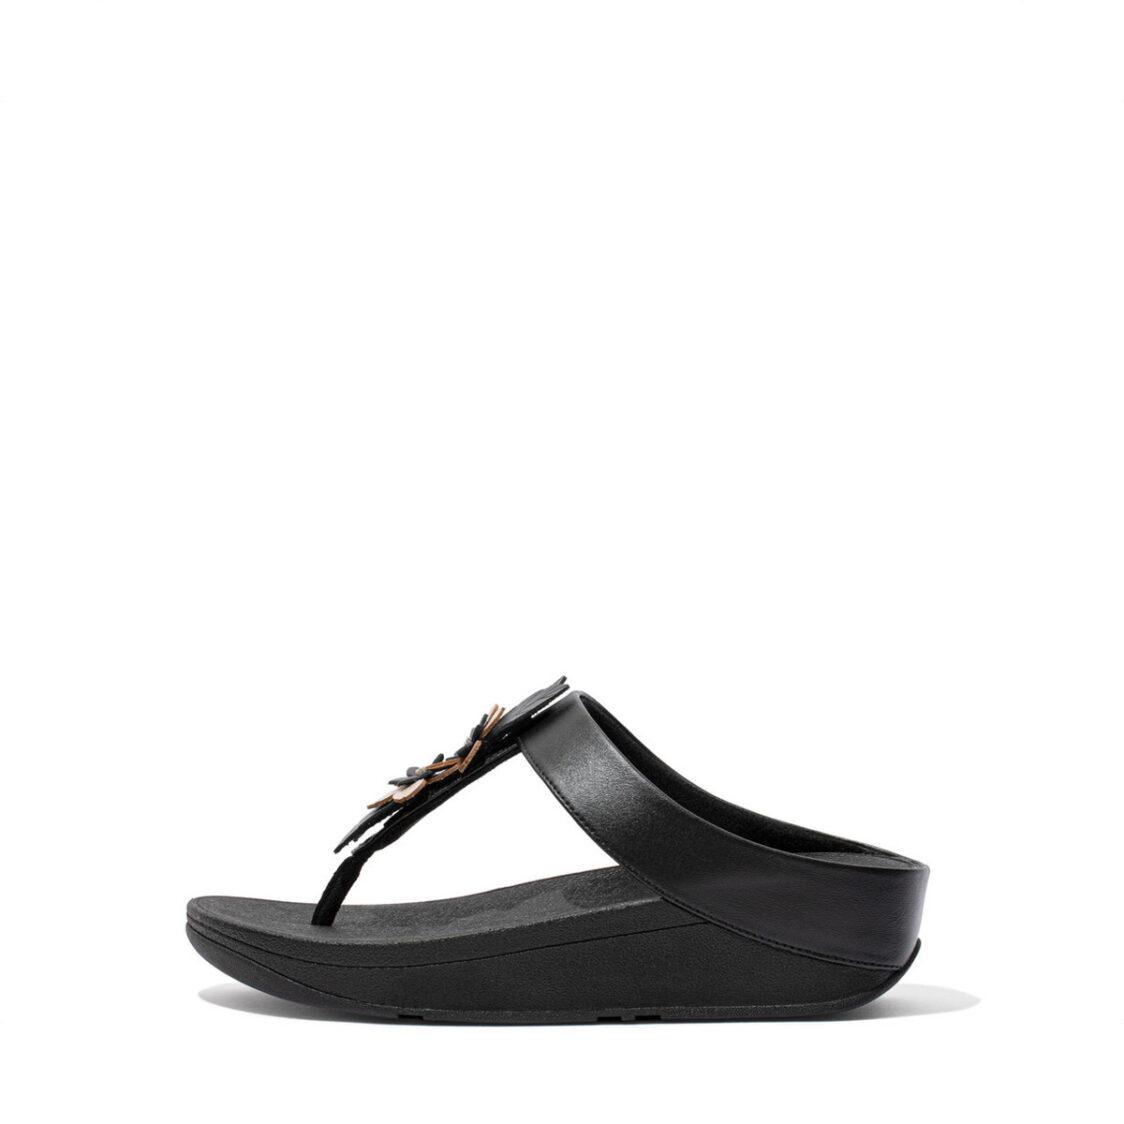 Fitflop Fino Floral Toe-Post Sandals Black Dz6-001